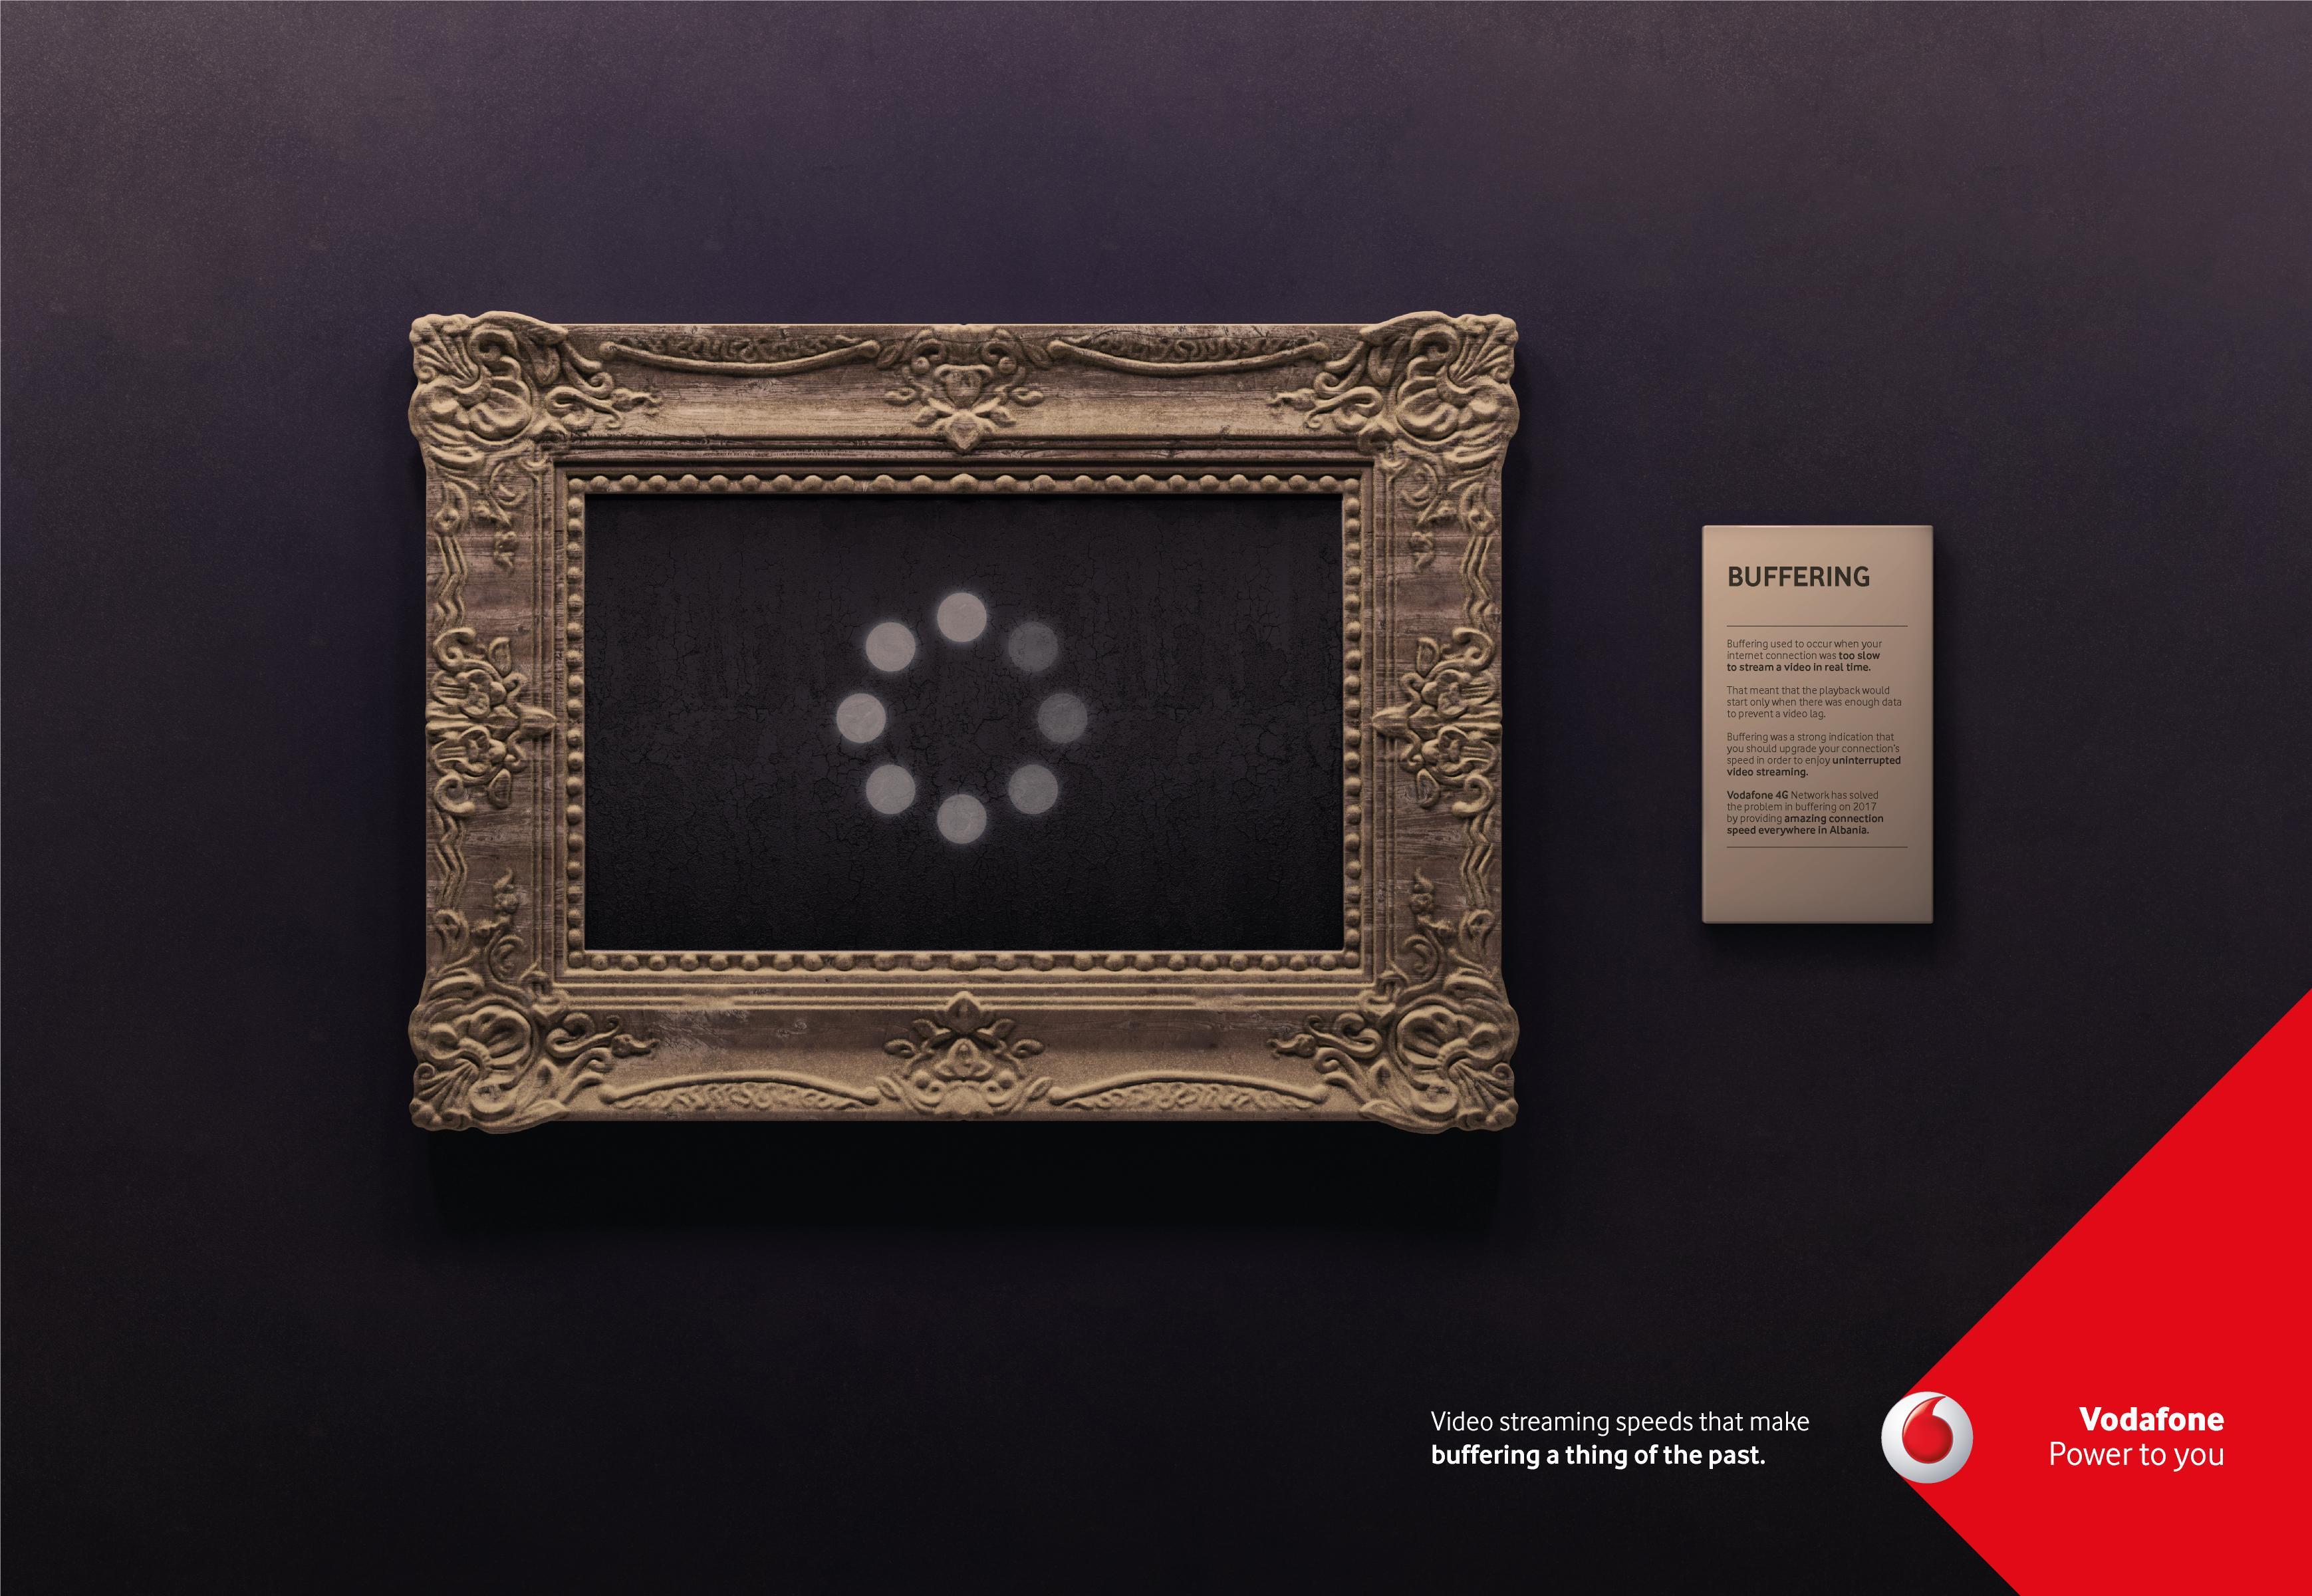 Vodafone Print Ad - Buffering, 1